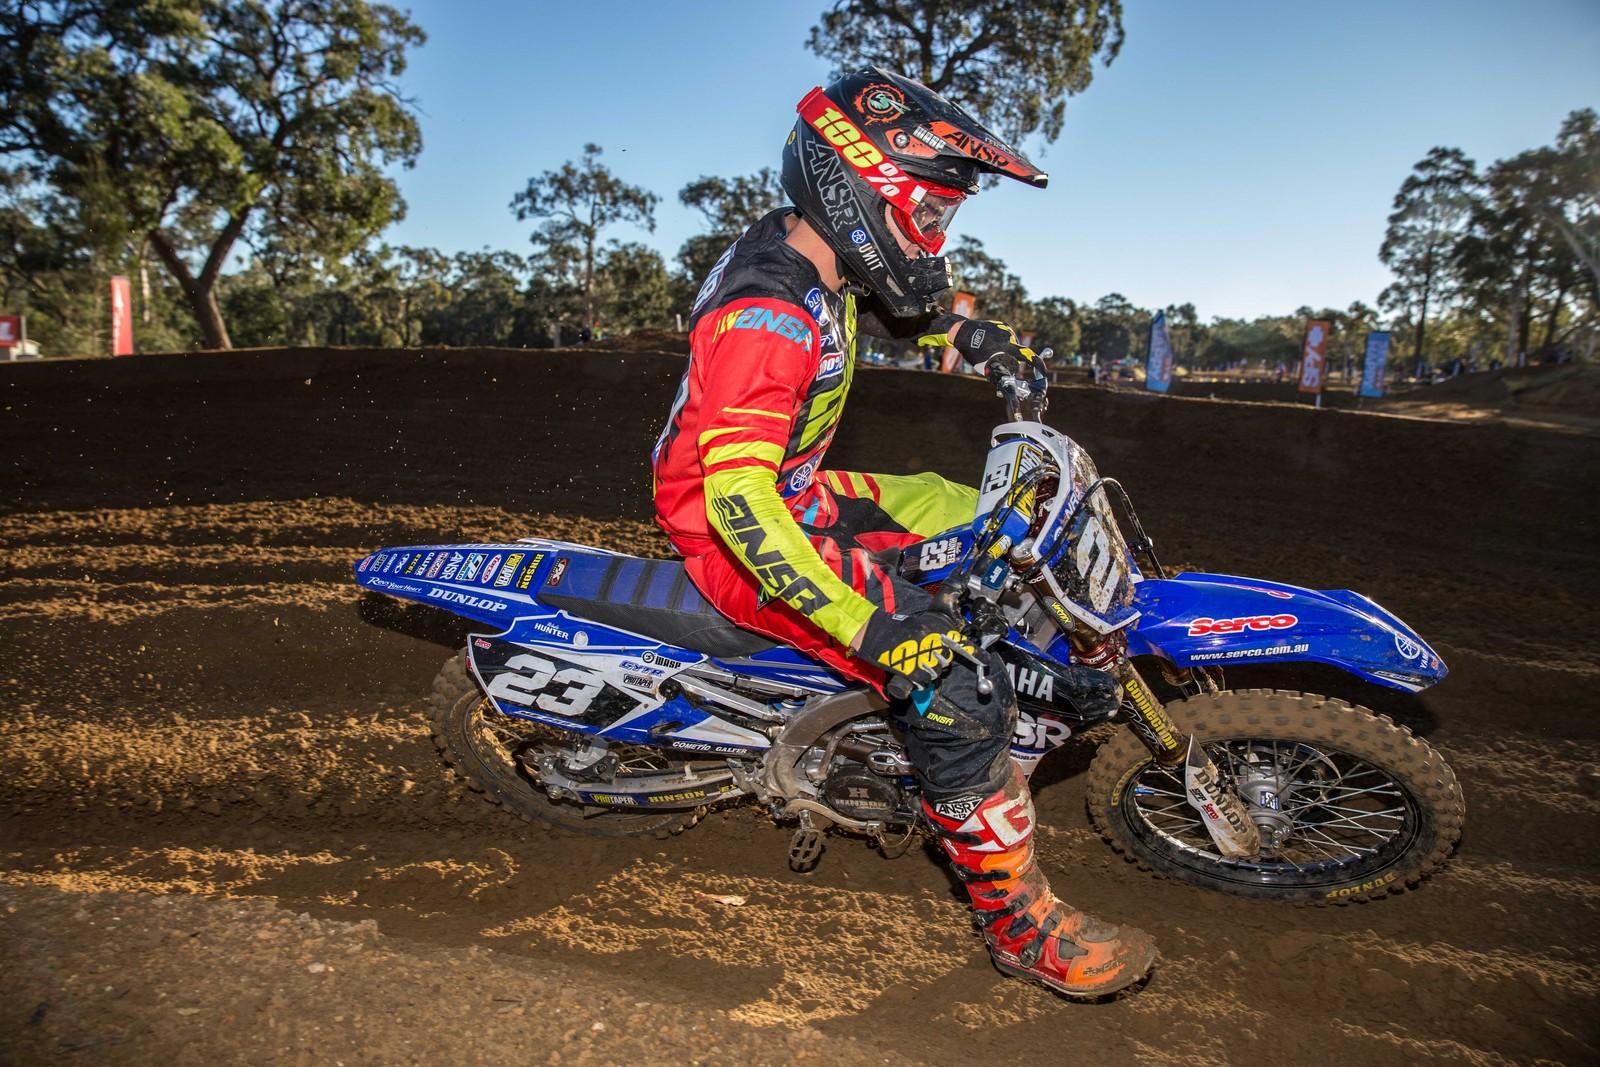 Wade Hunter - Australian Motul MX Championships: Round 6, Nowra - Motocross Pictures - Vital MX